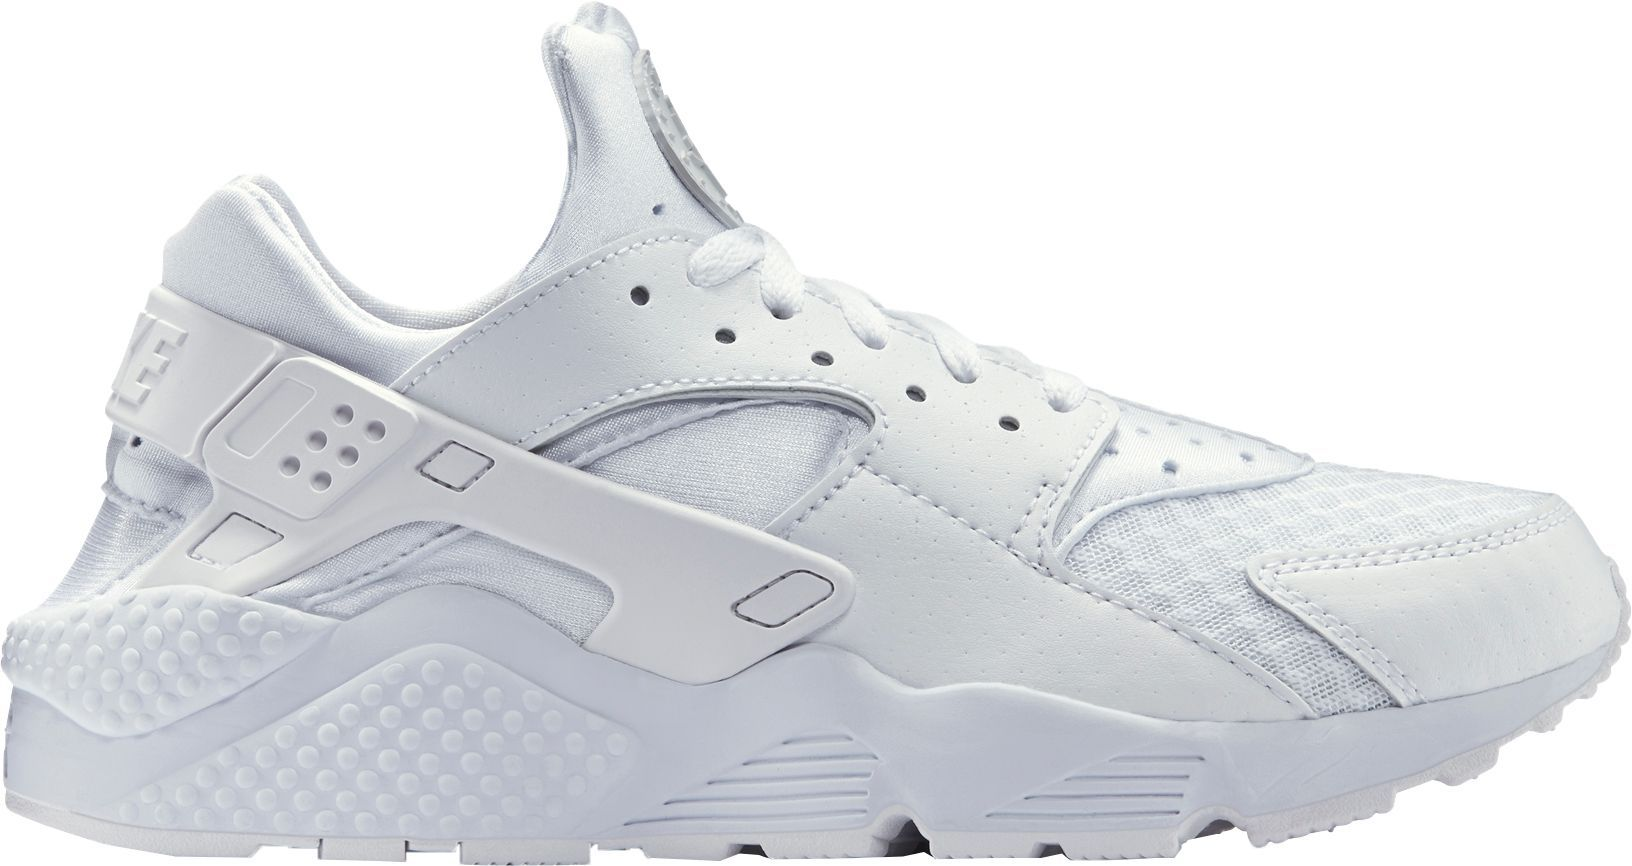 Nike Men's Air Huarache Run Shoes, Size